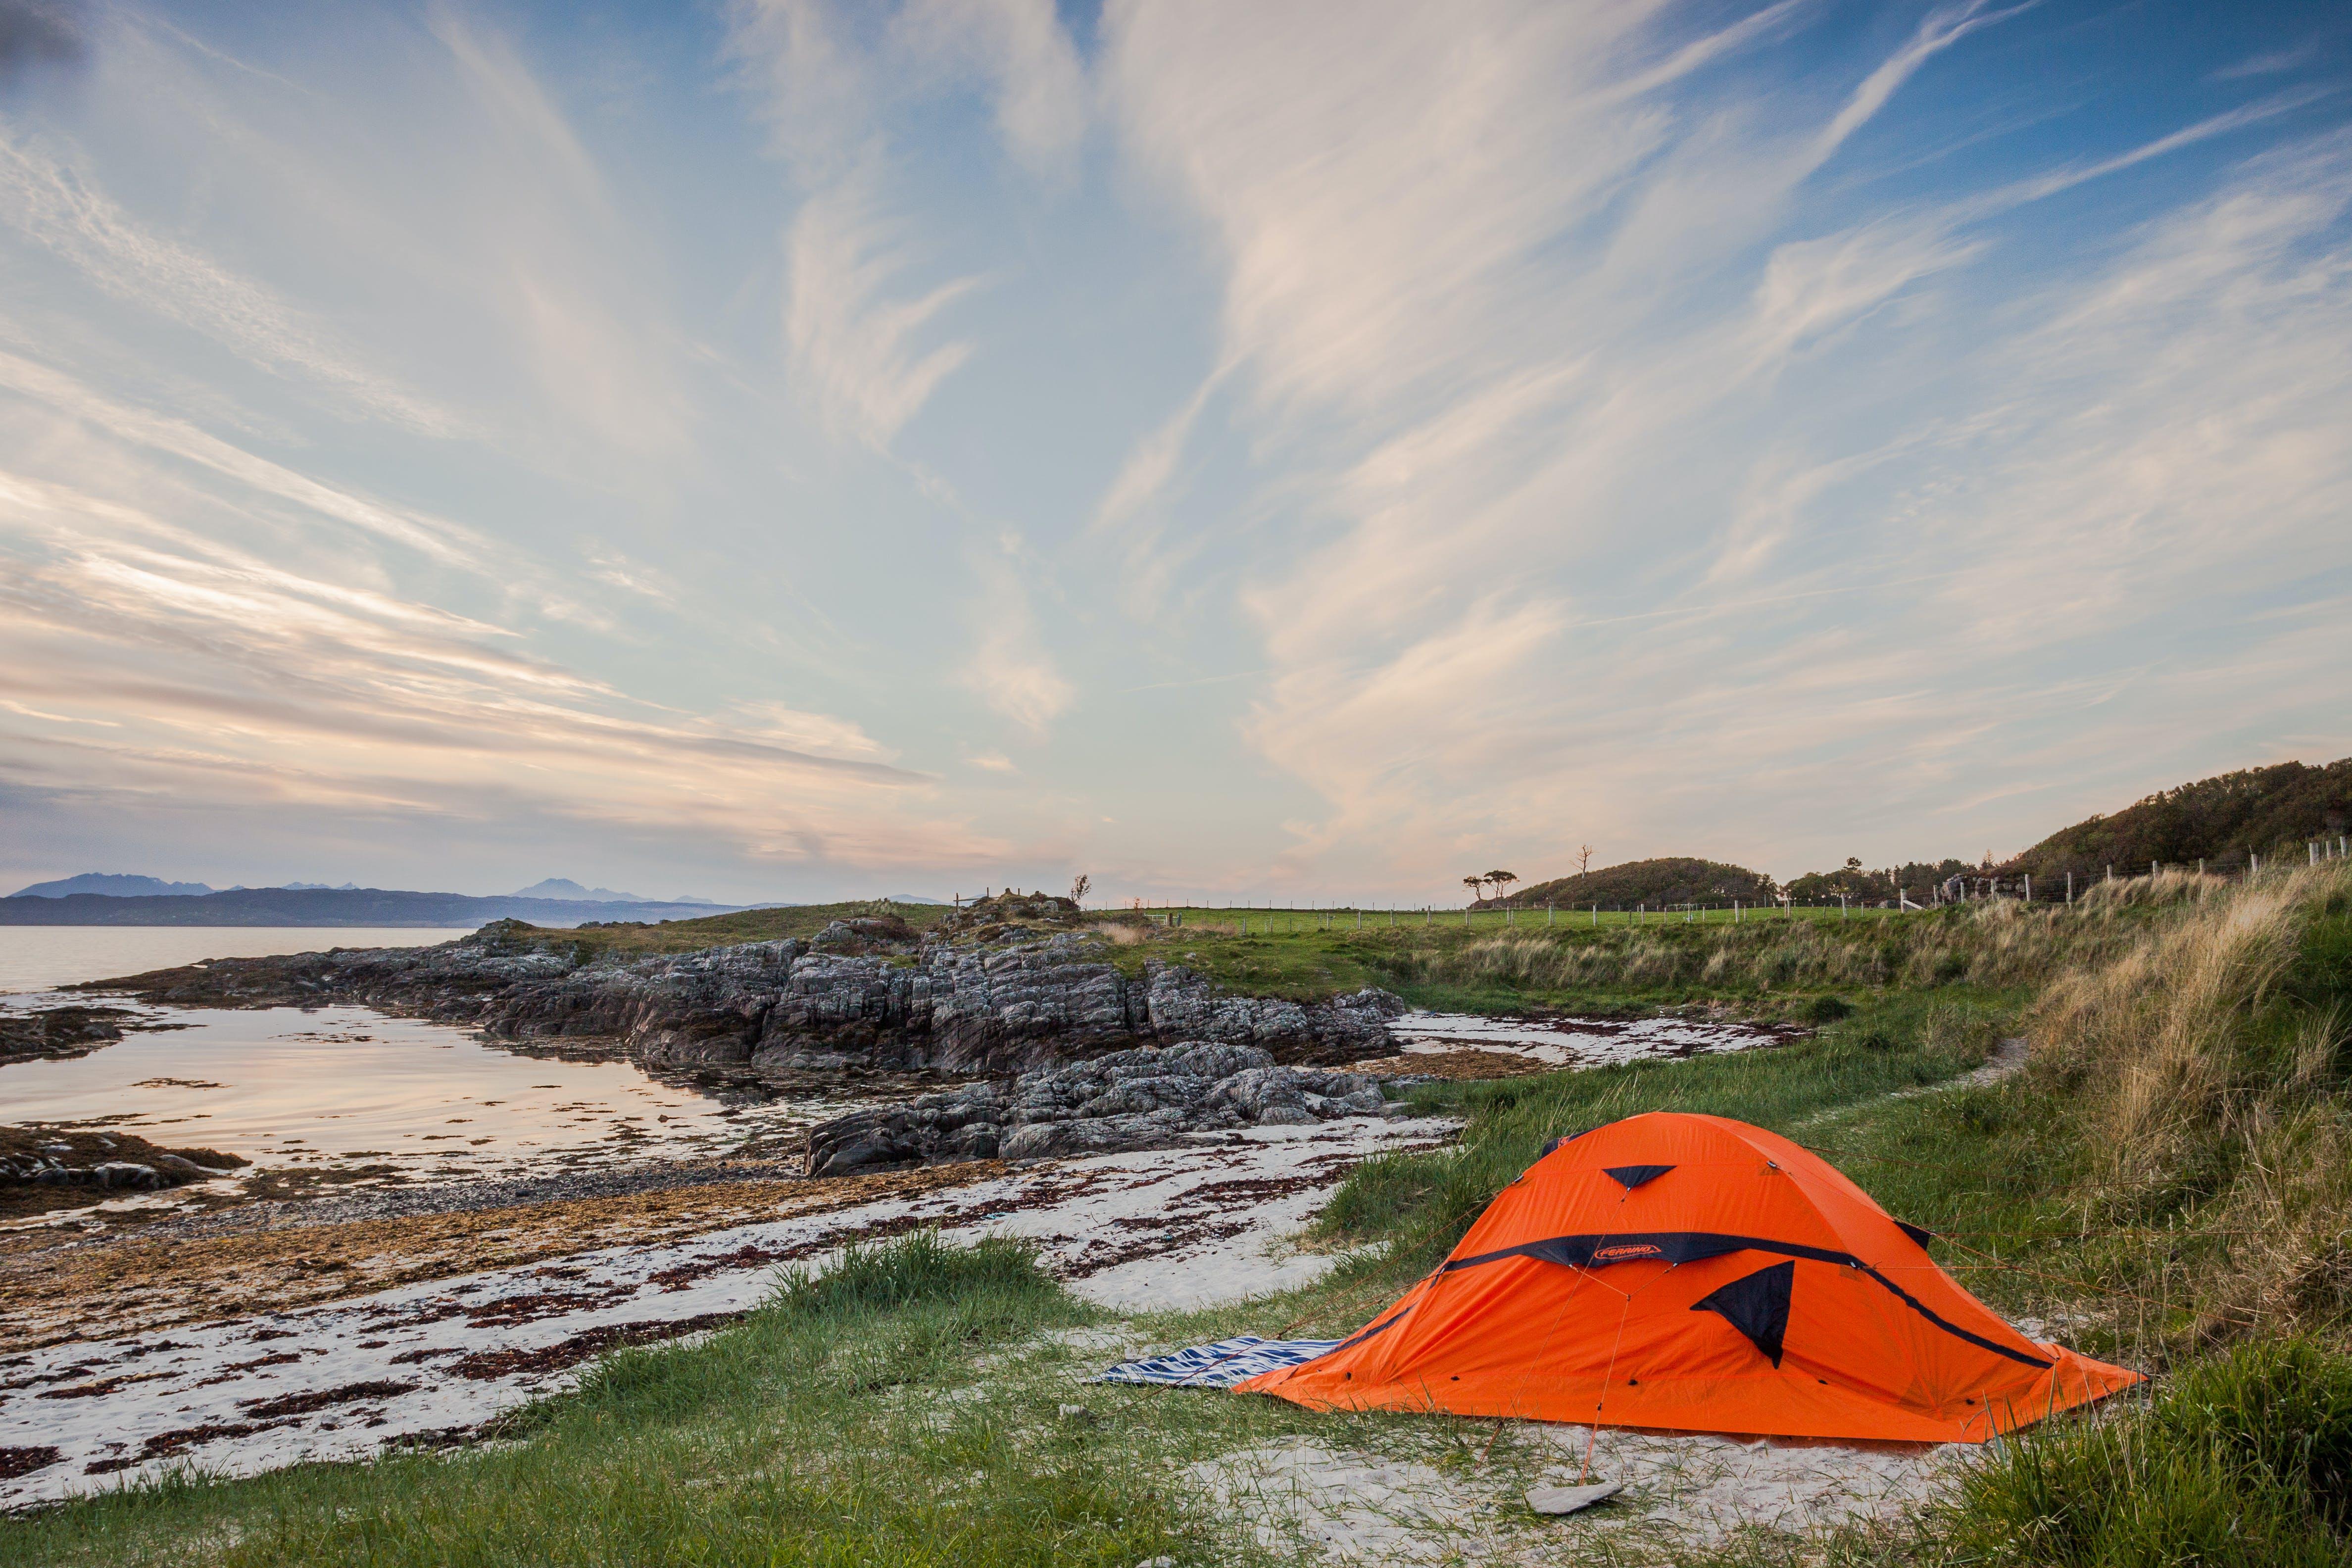 Orange Camping Tent Near Body of Water during Daytime